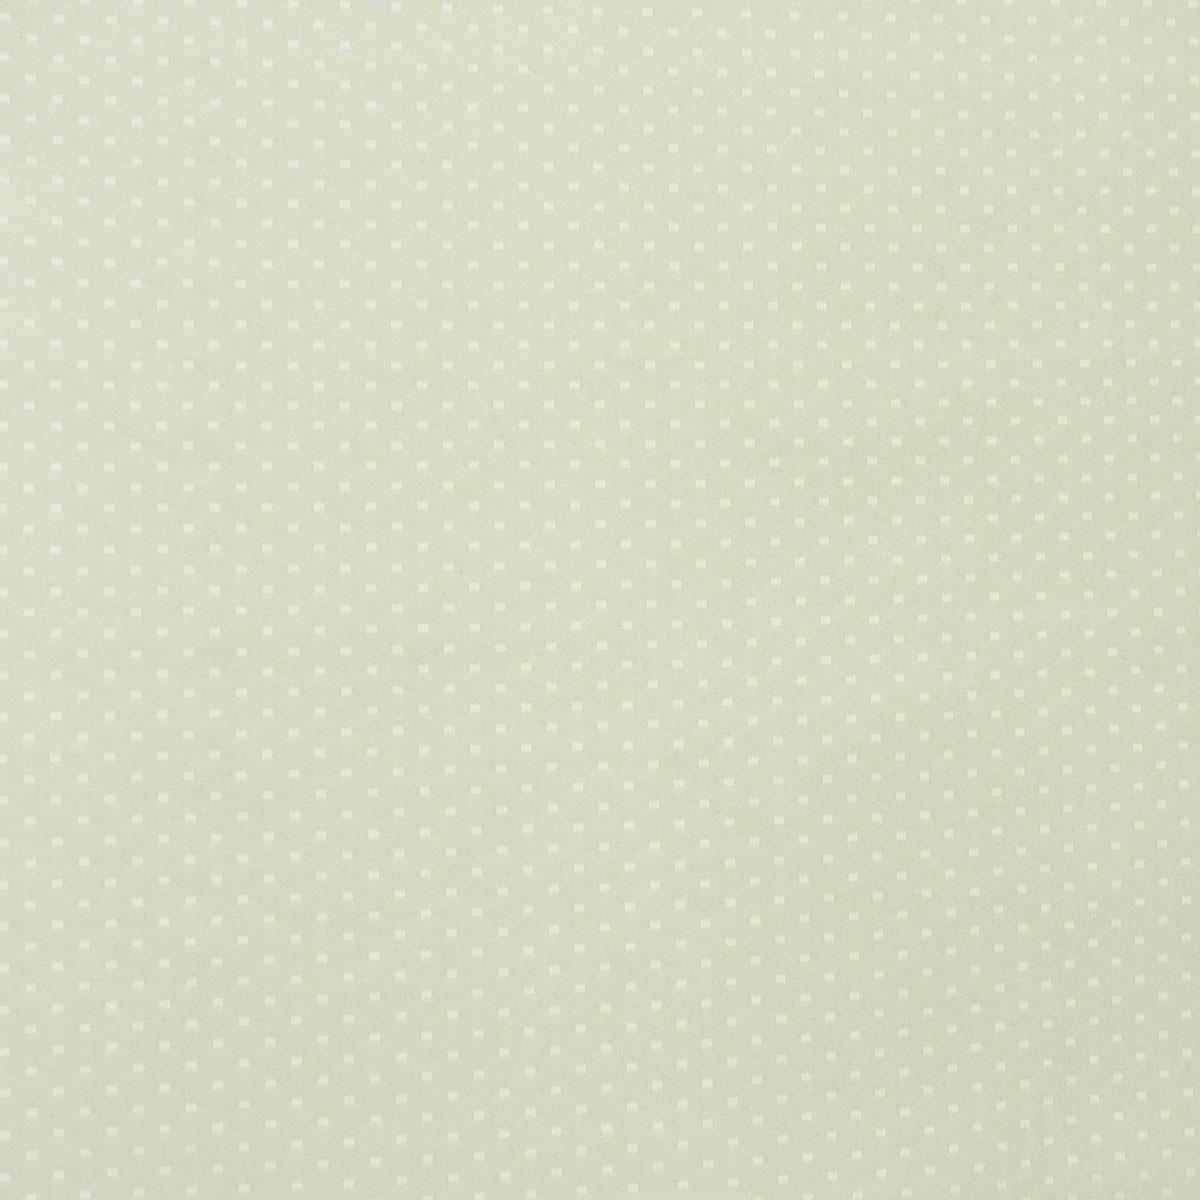 Gardinenstoff Dekostoff Jacquard leinengrau 2